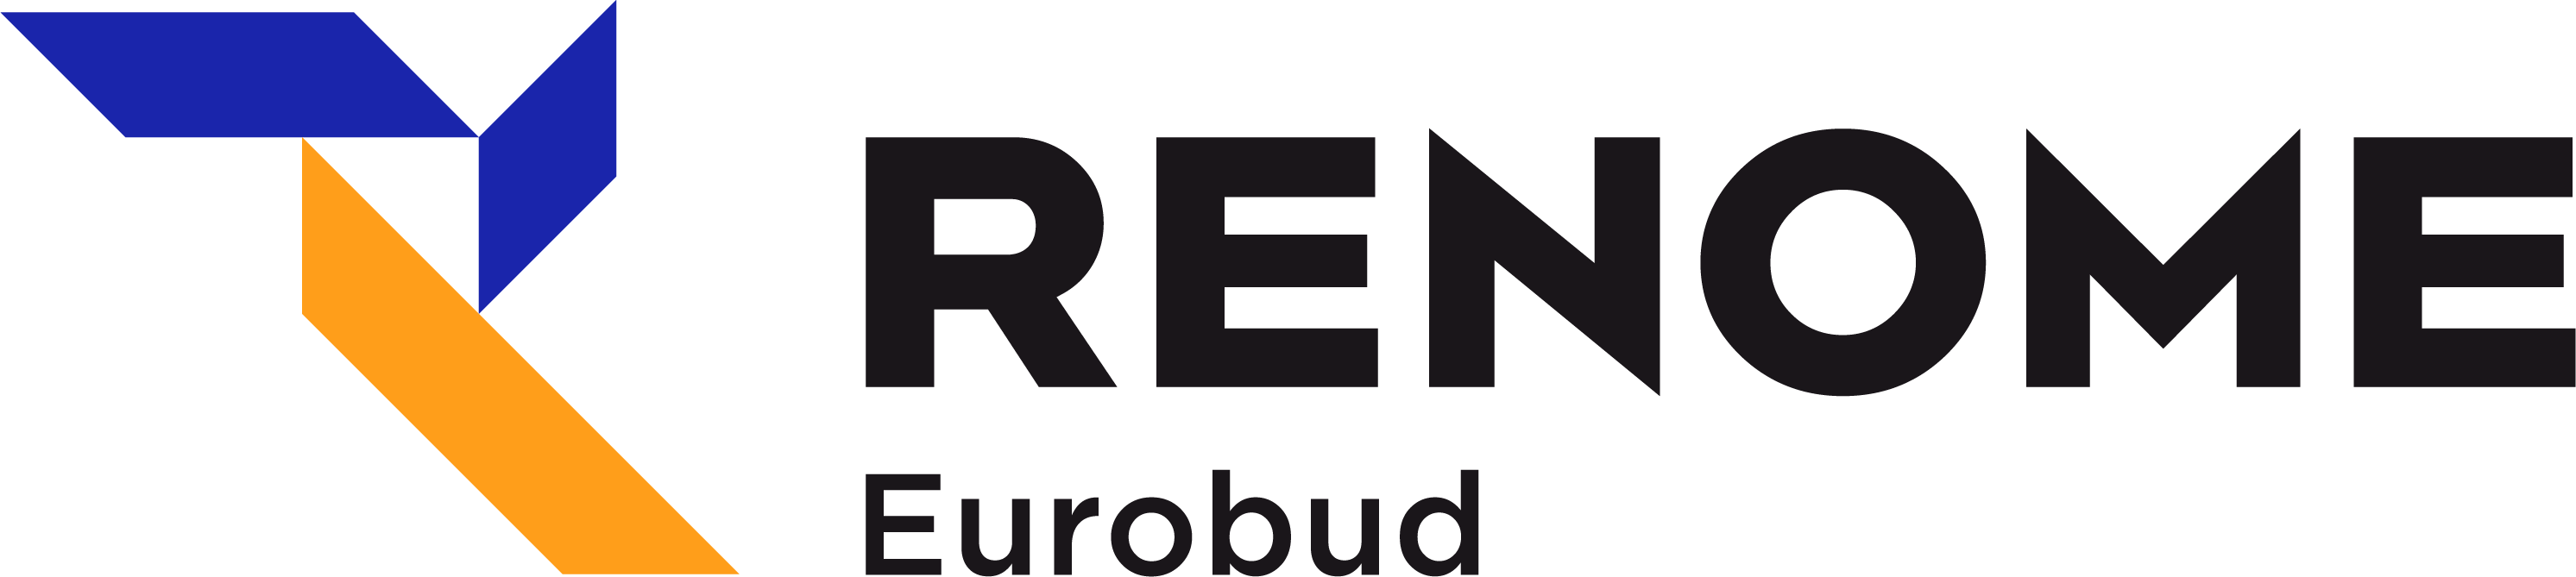 RENOME EUROBUD